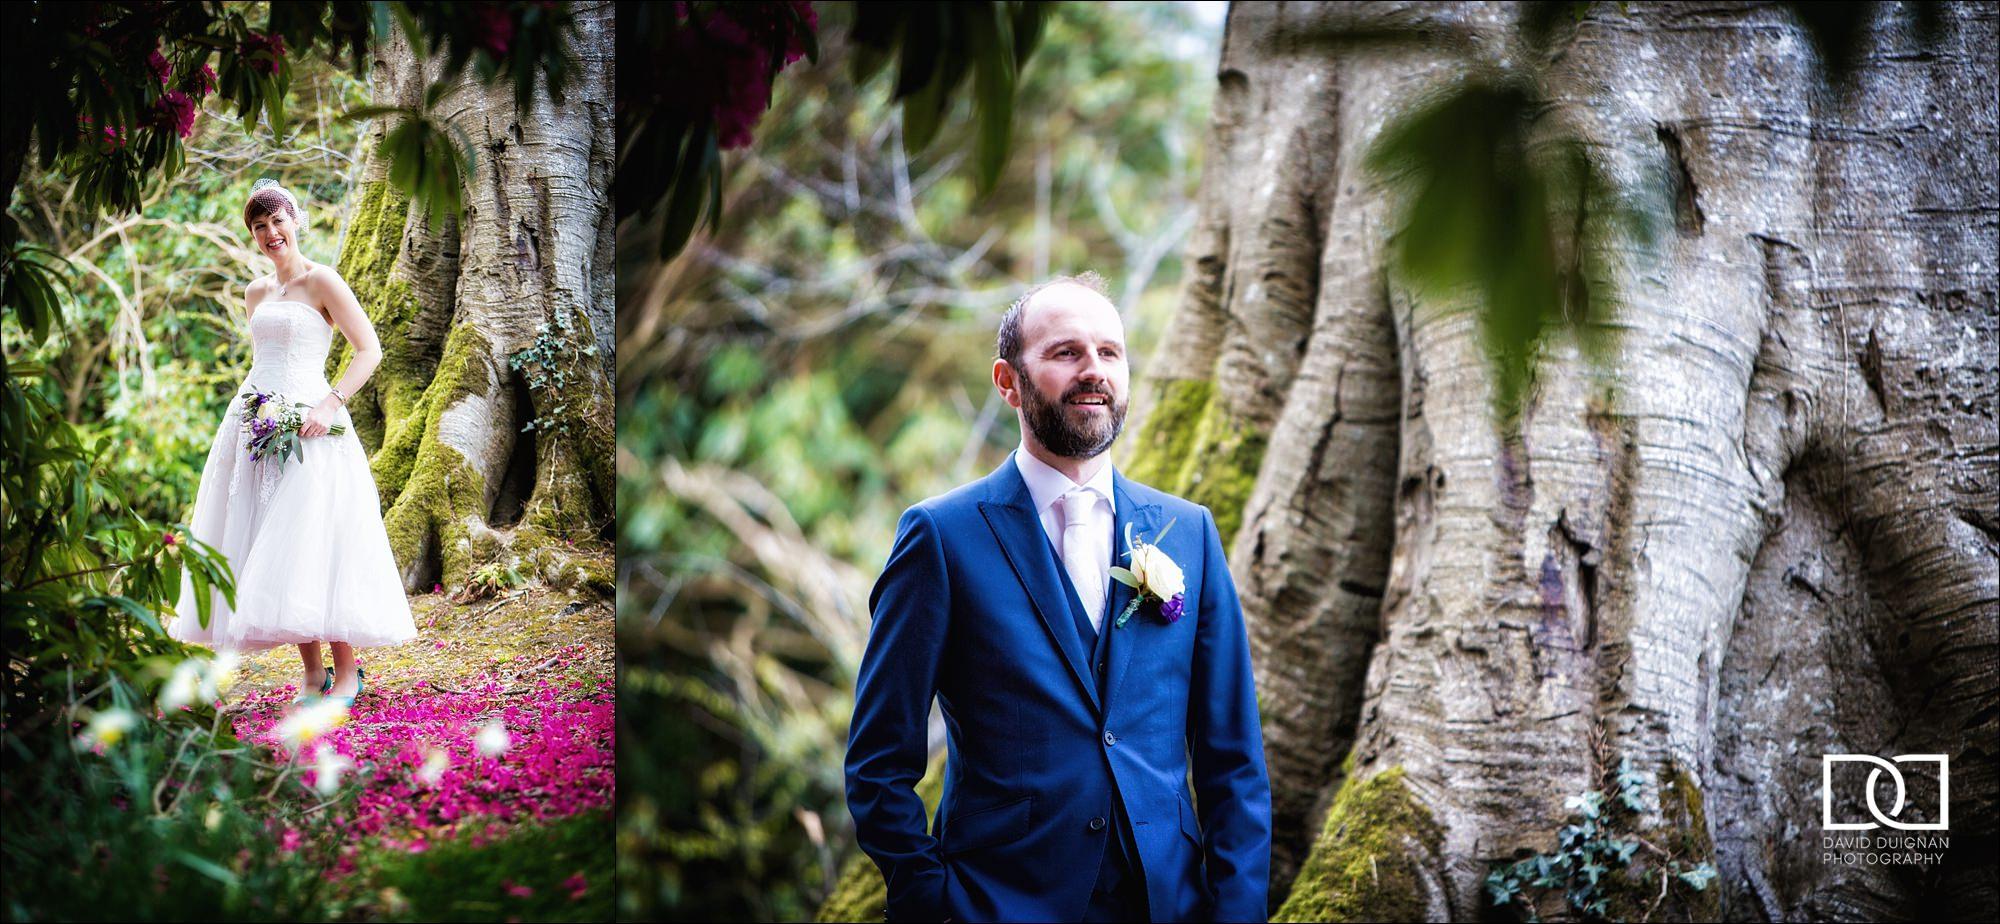 dublin wedding photographer david duignan photography horetown house wedding wexford Ireland 0035